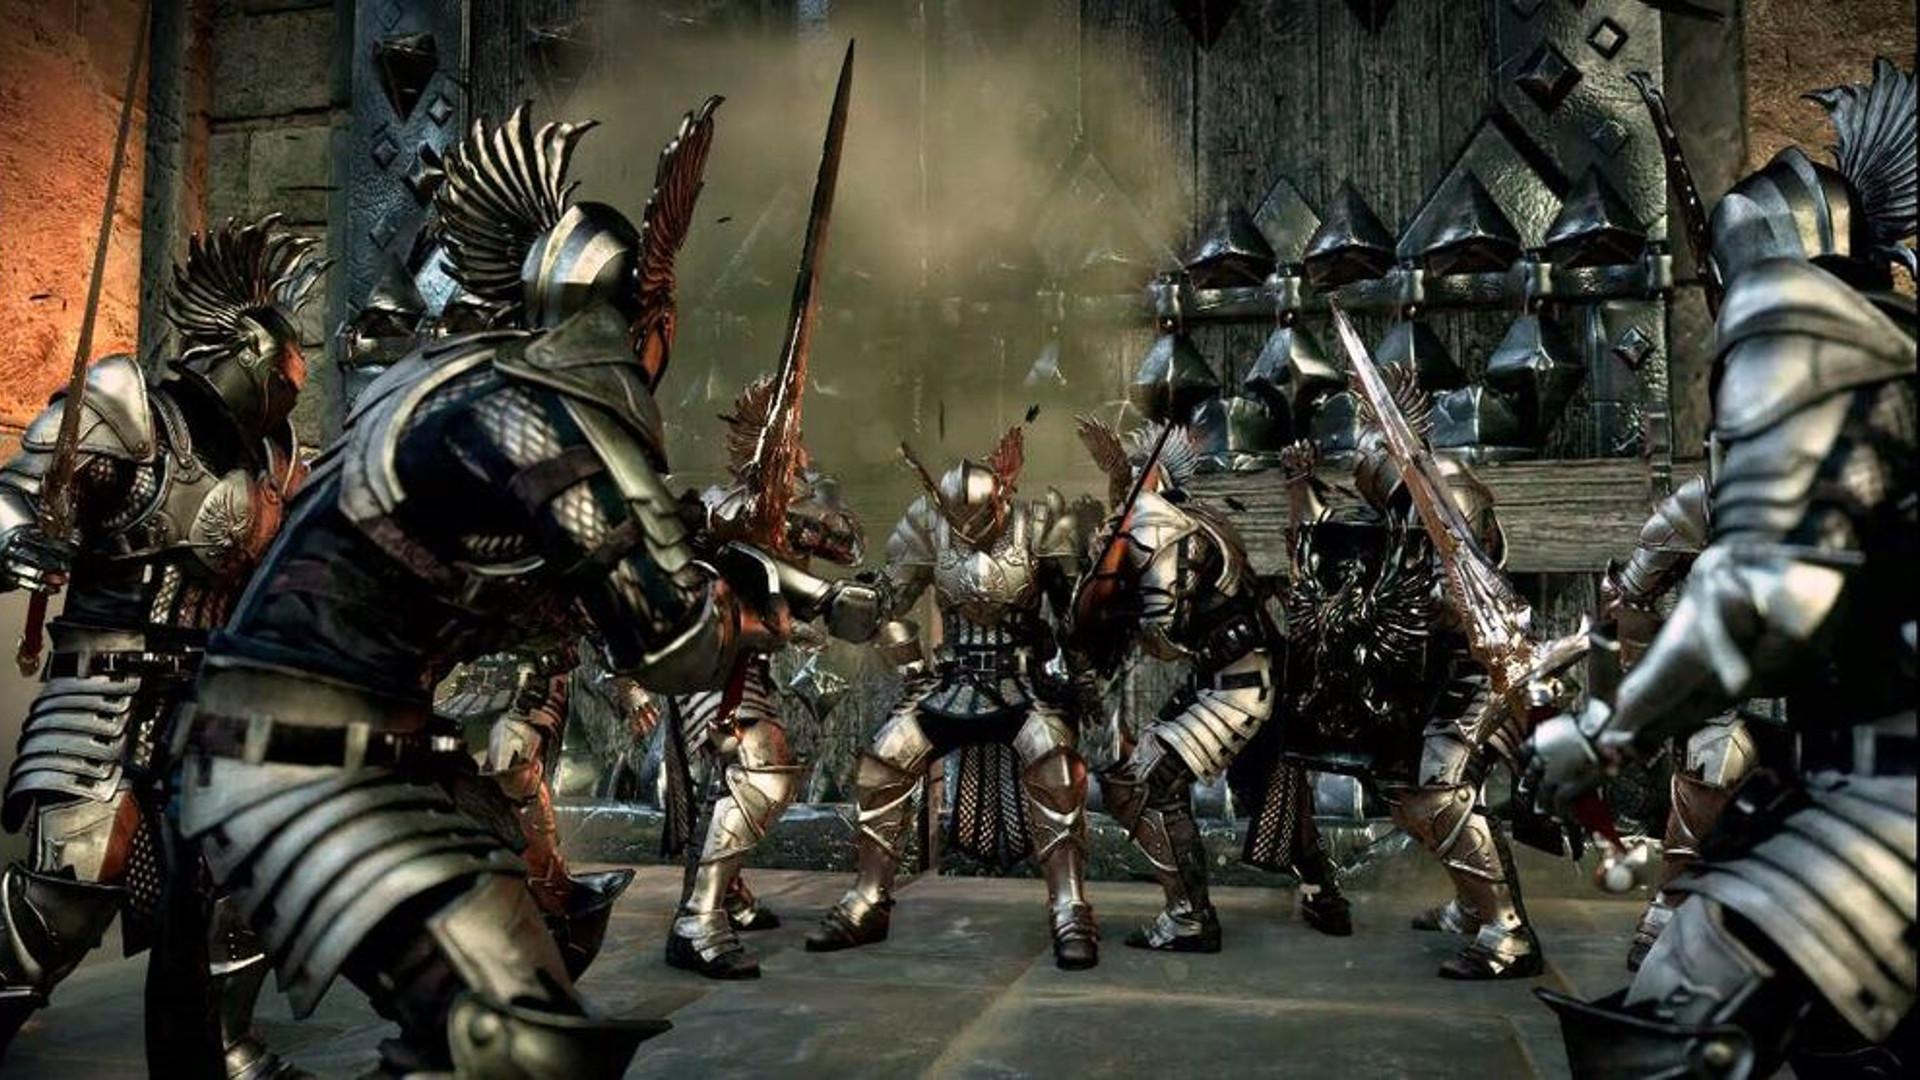 New Dragon Age 4 concept art hints at Grey Wardens return